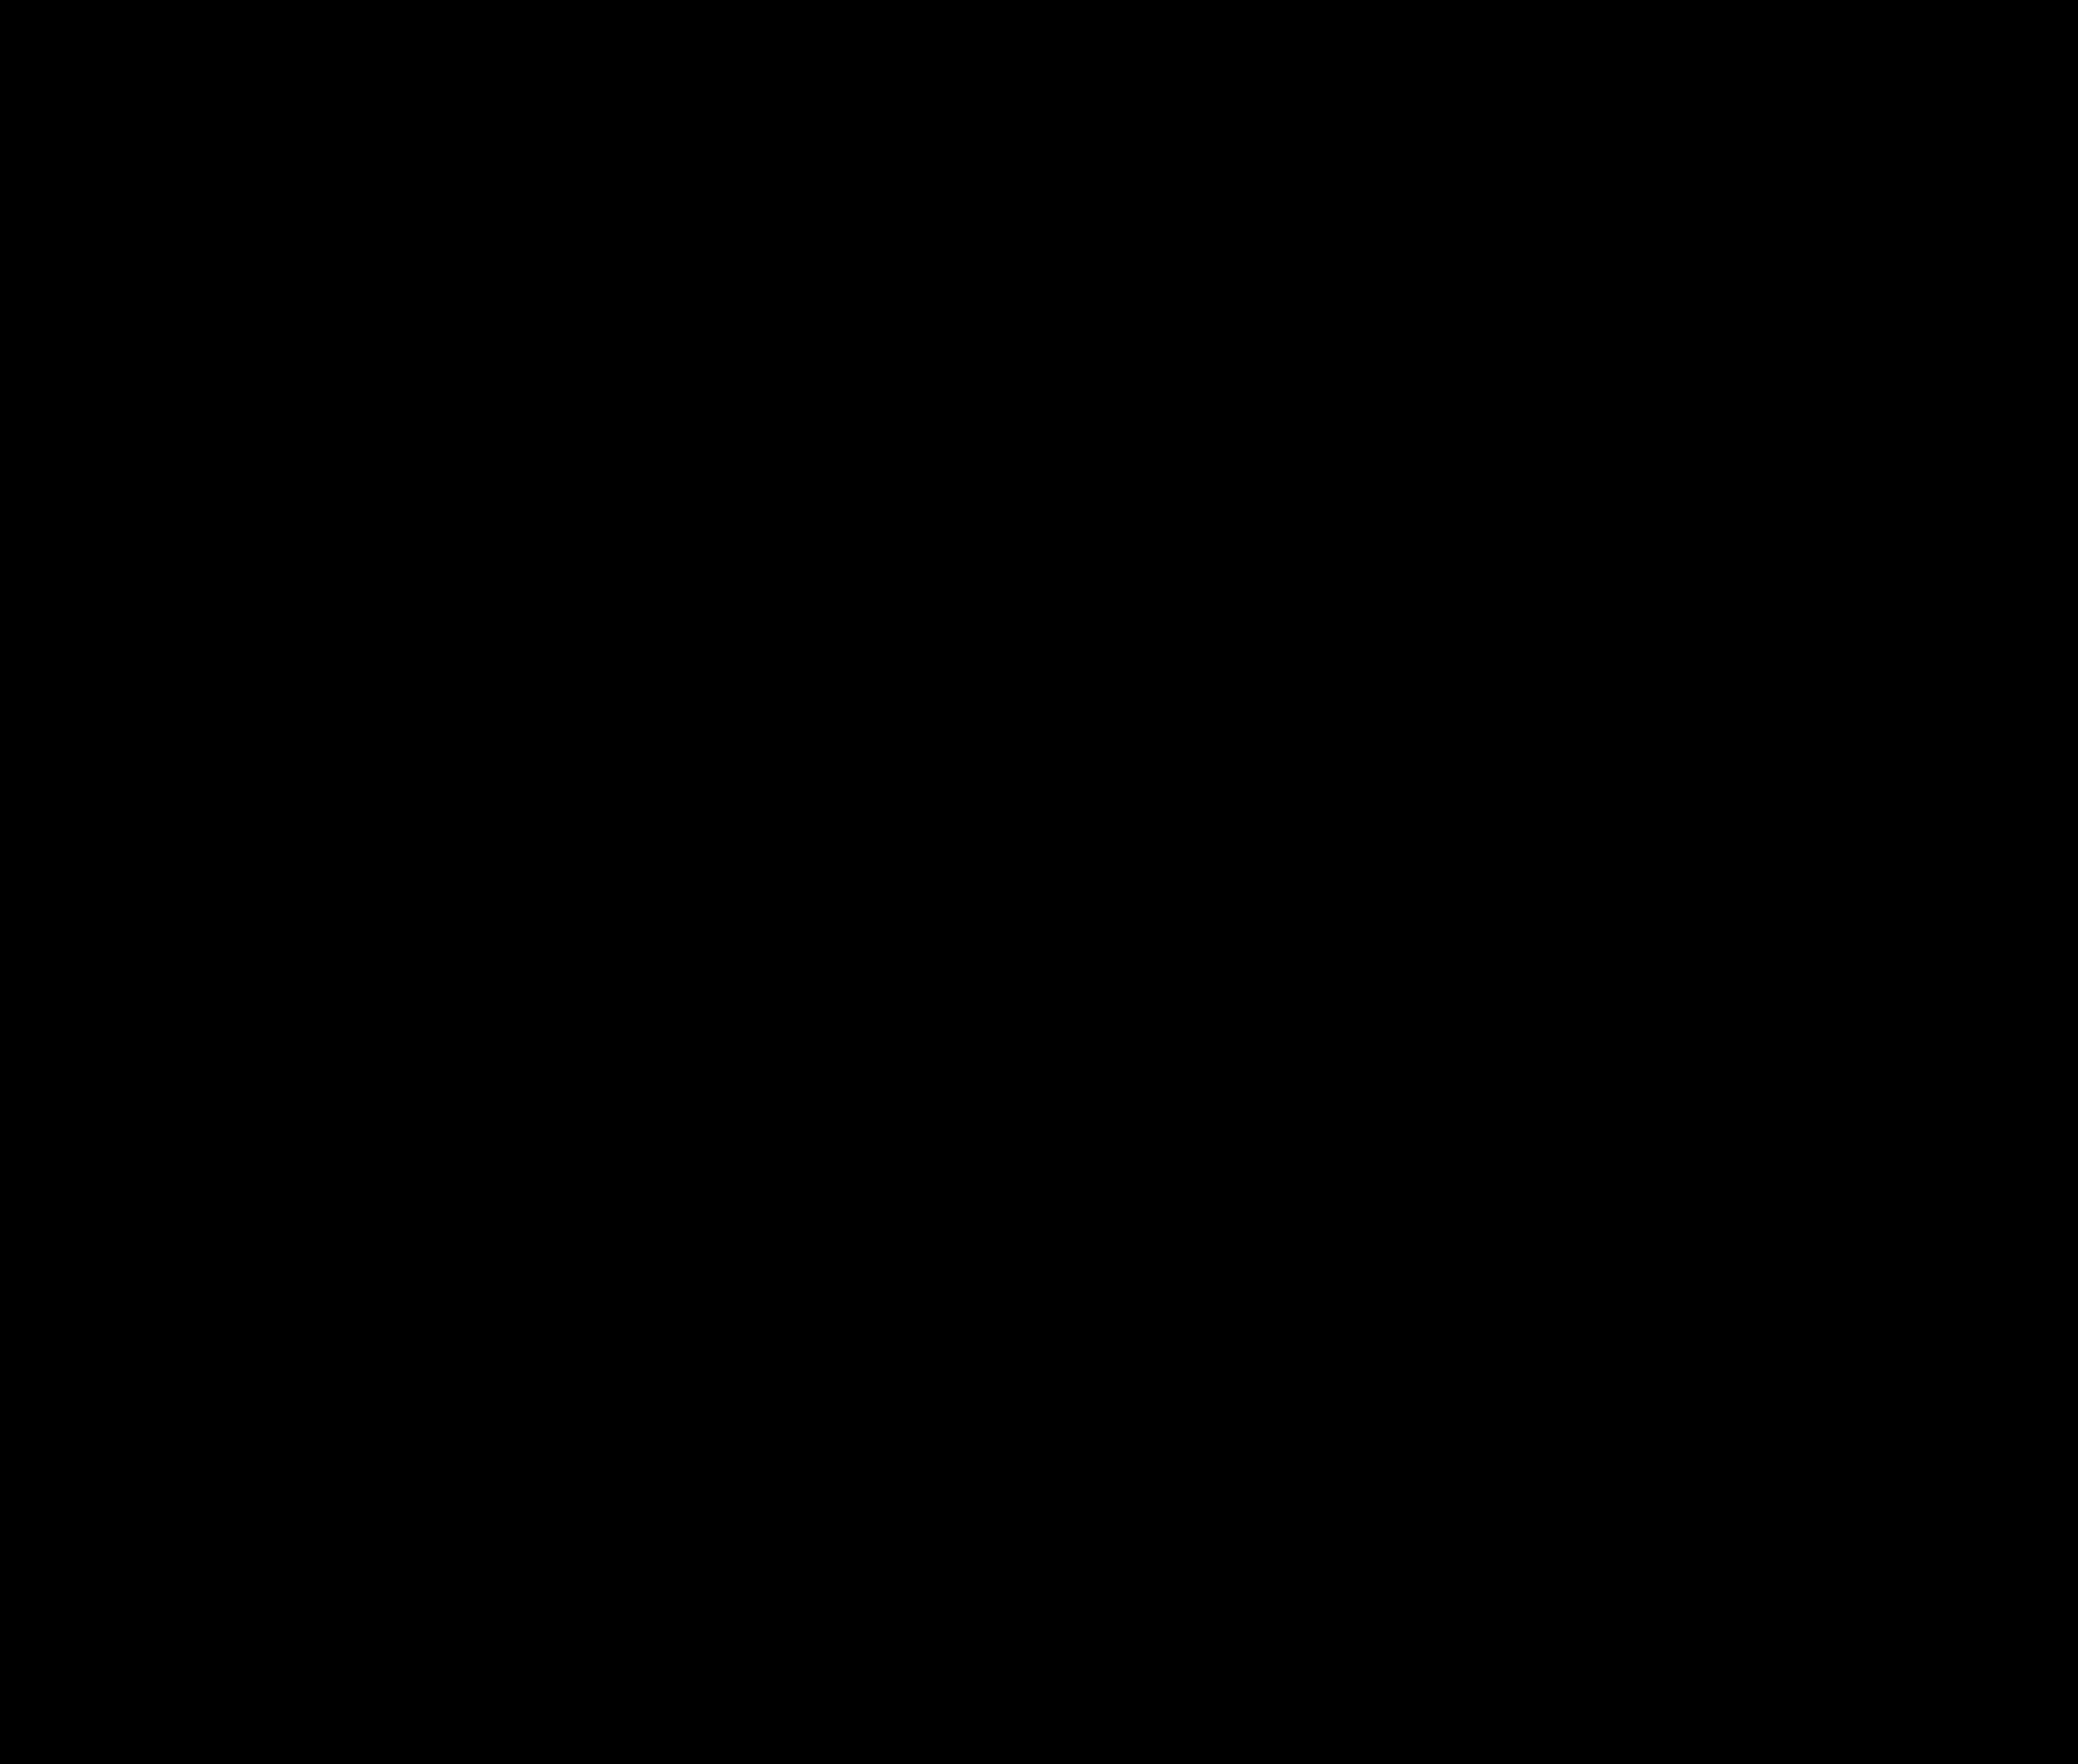 2332x1980 Clipart